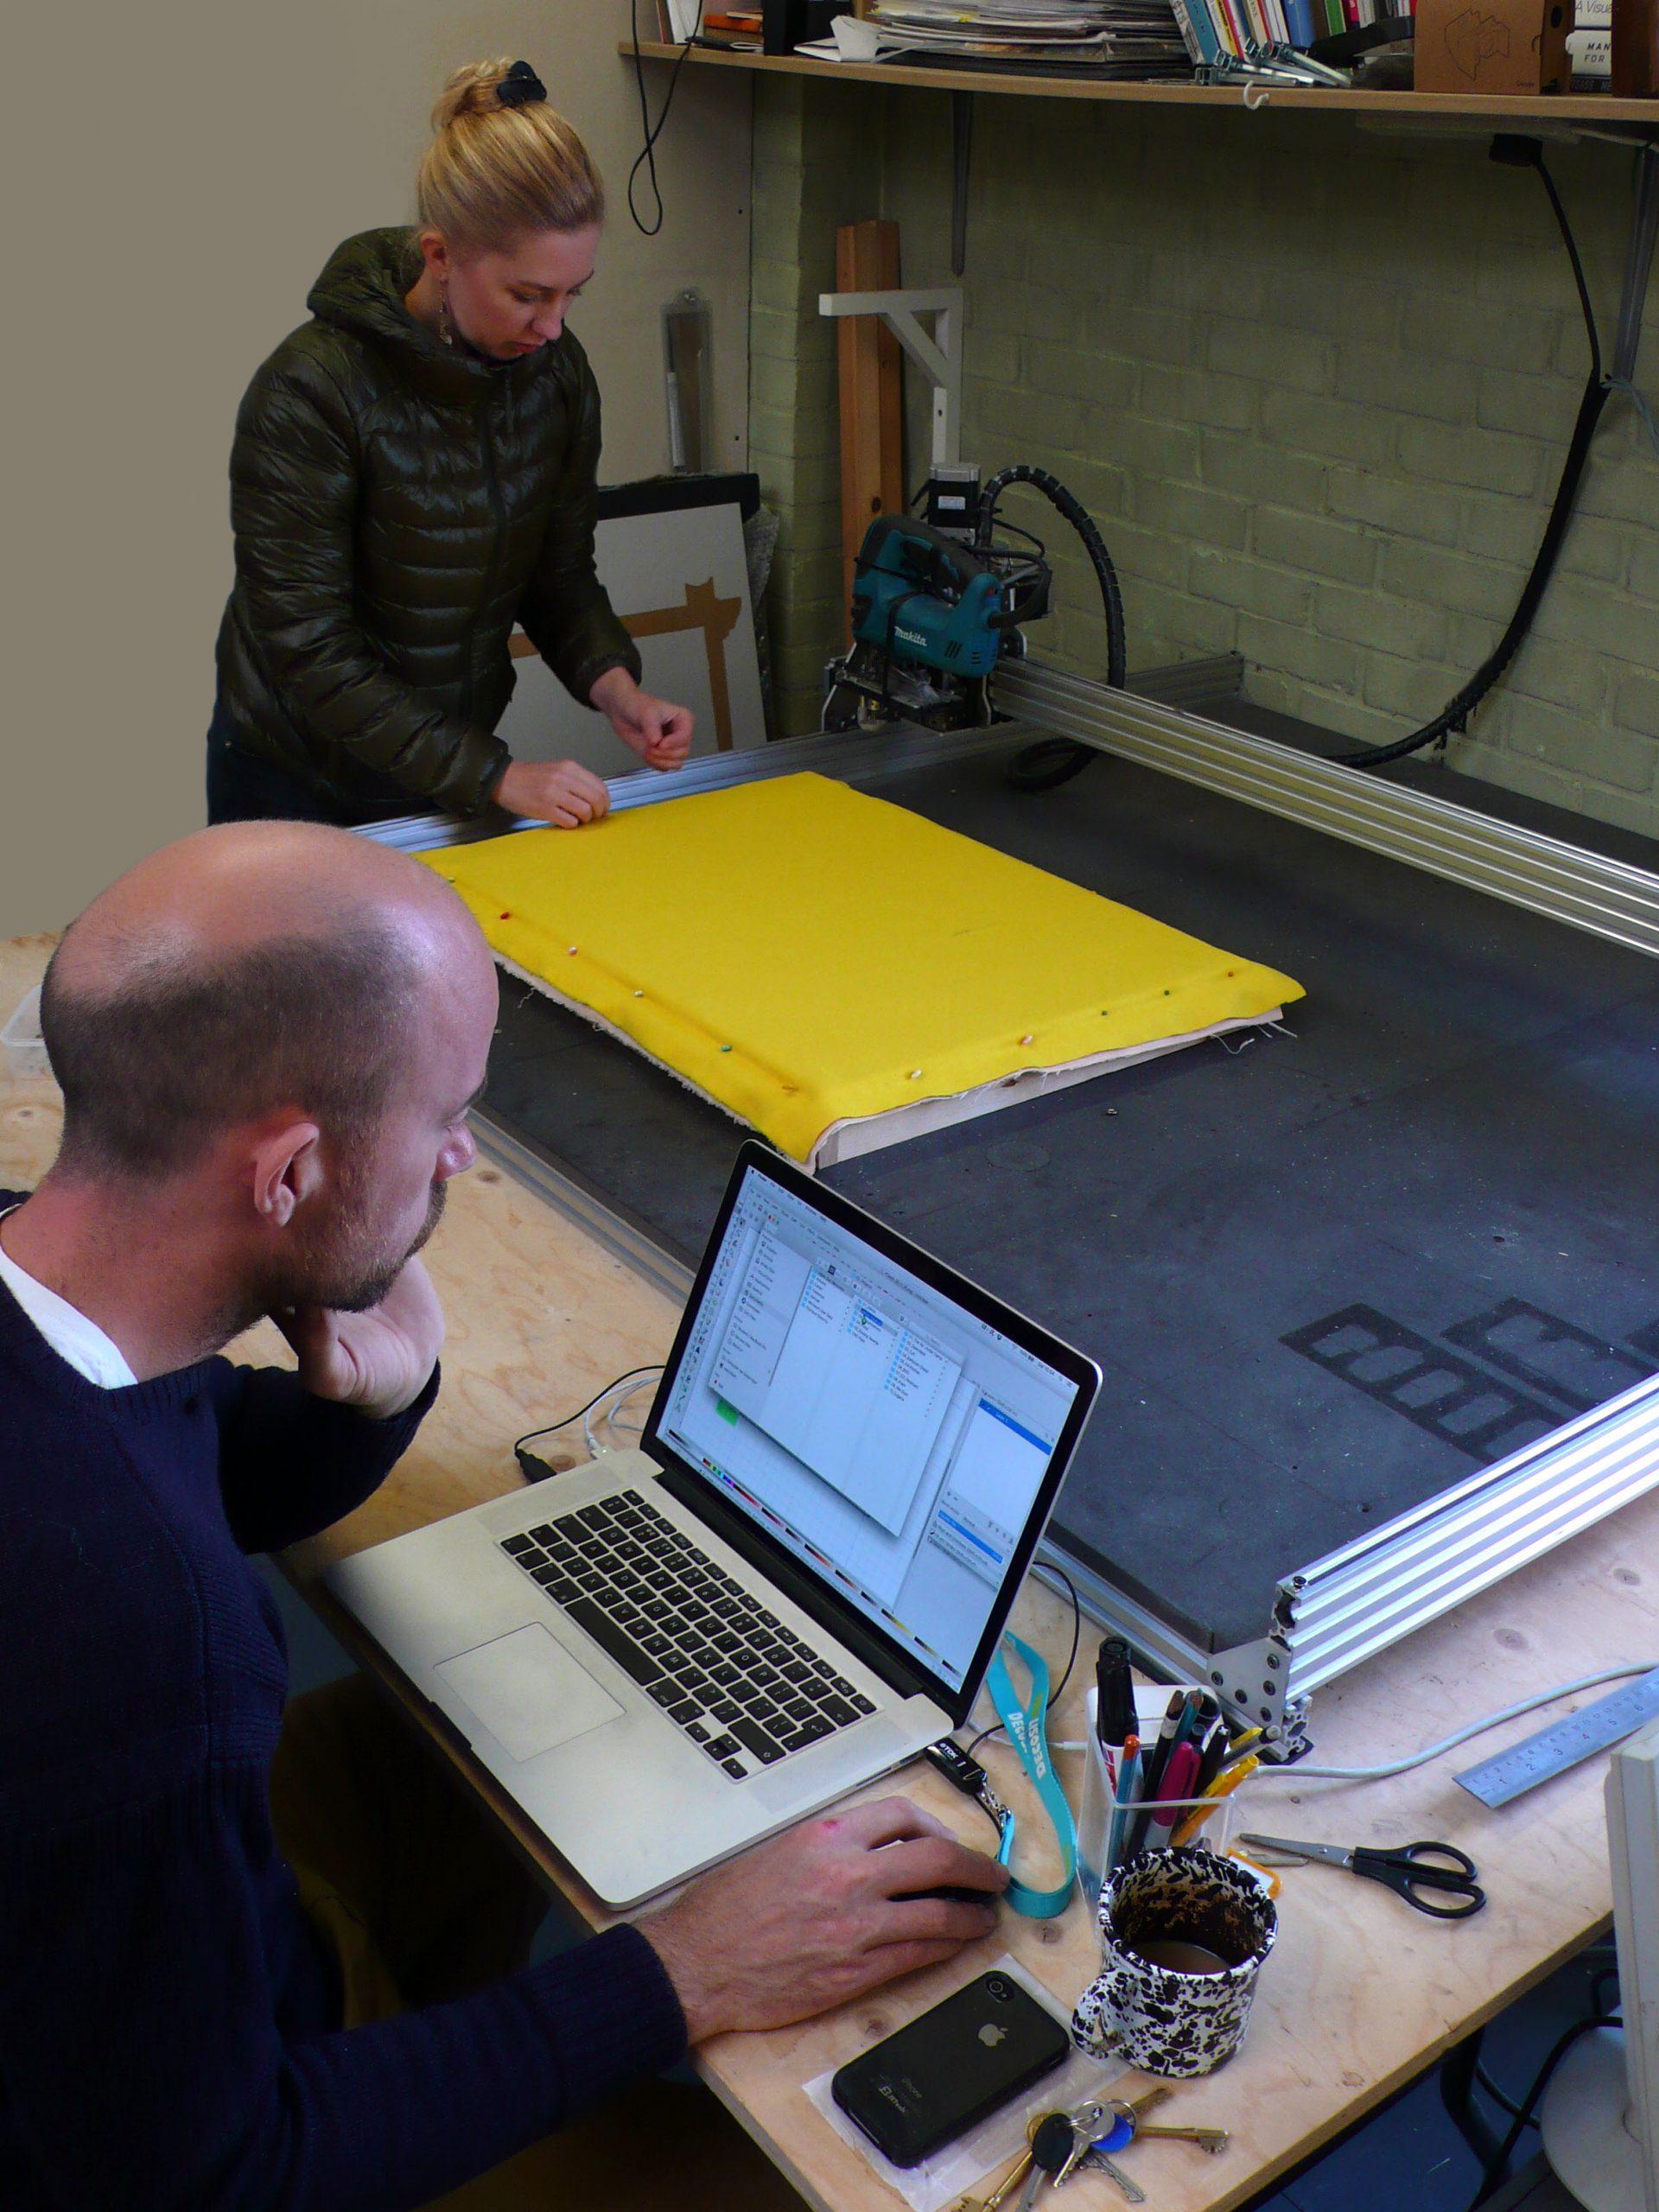 Working in specialised workshops